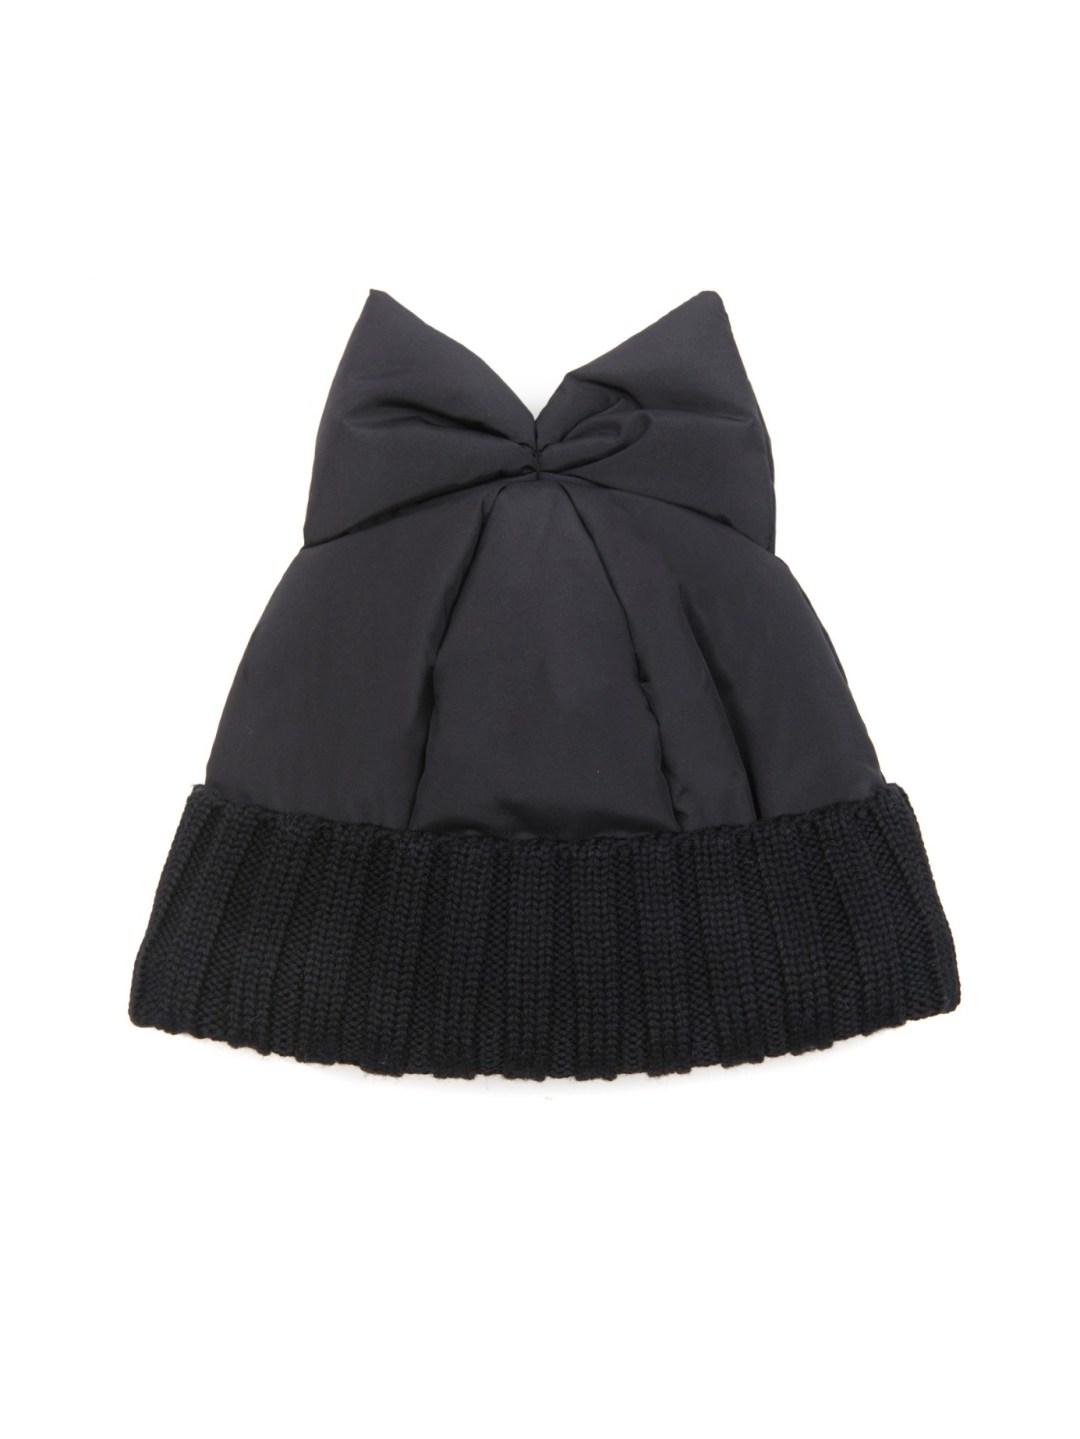 Federica Moretti Bow Hat